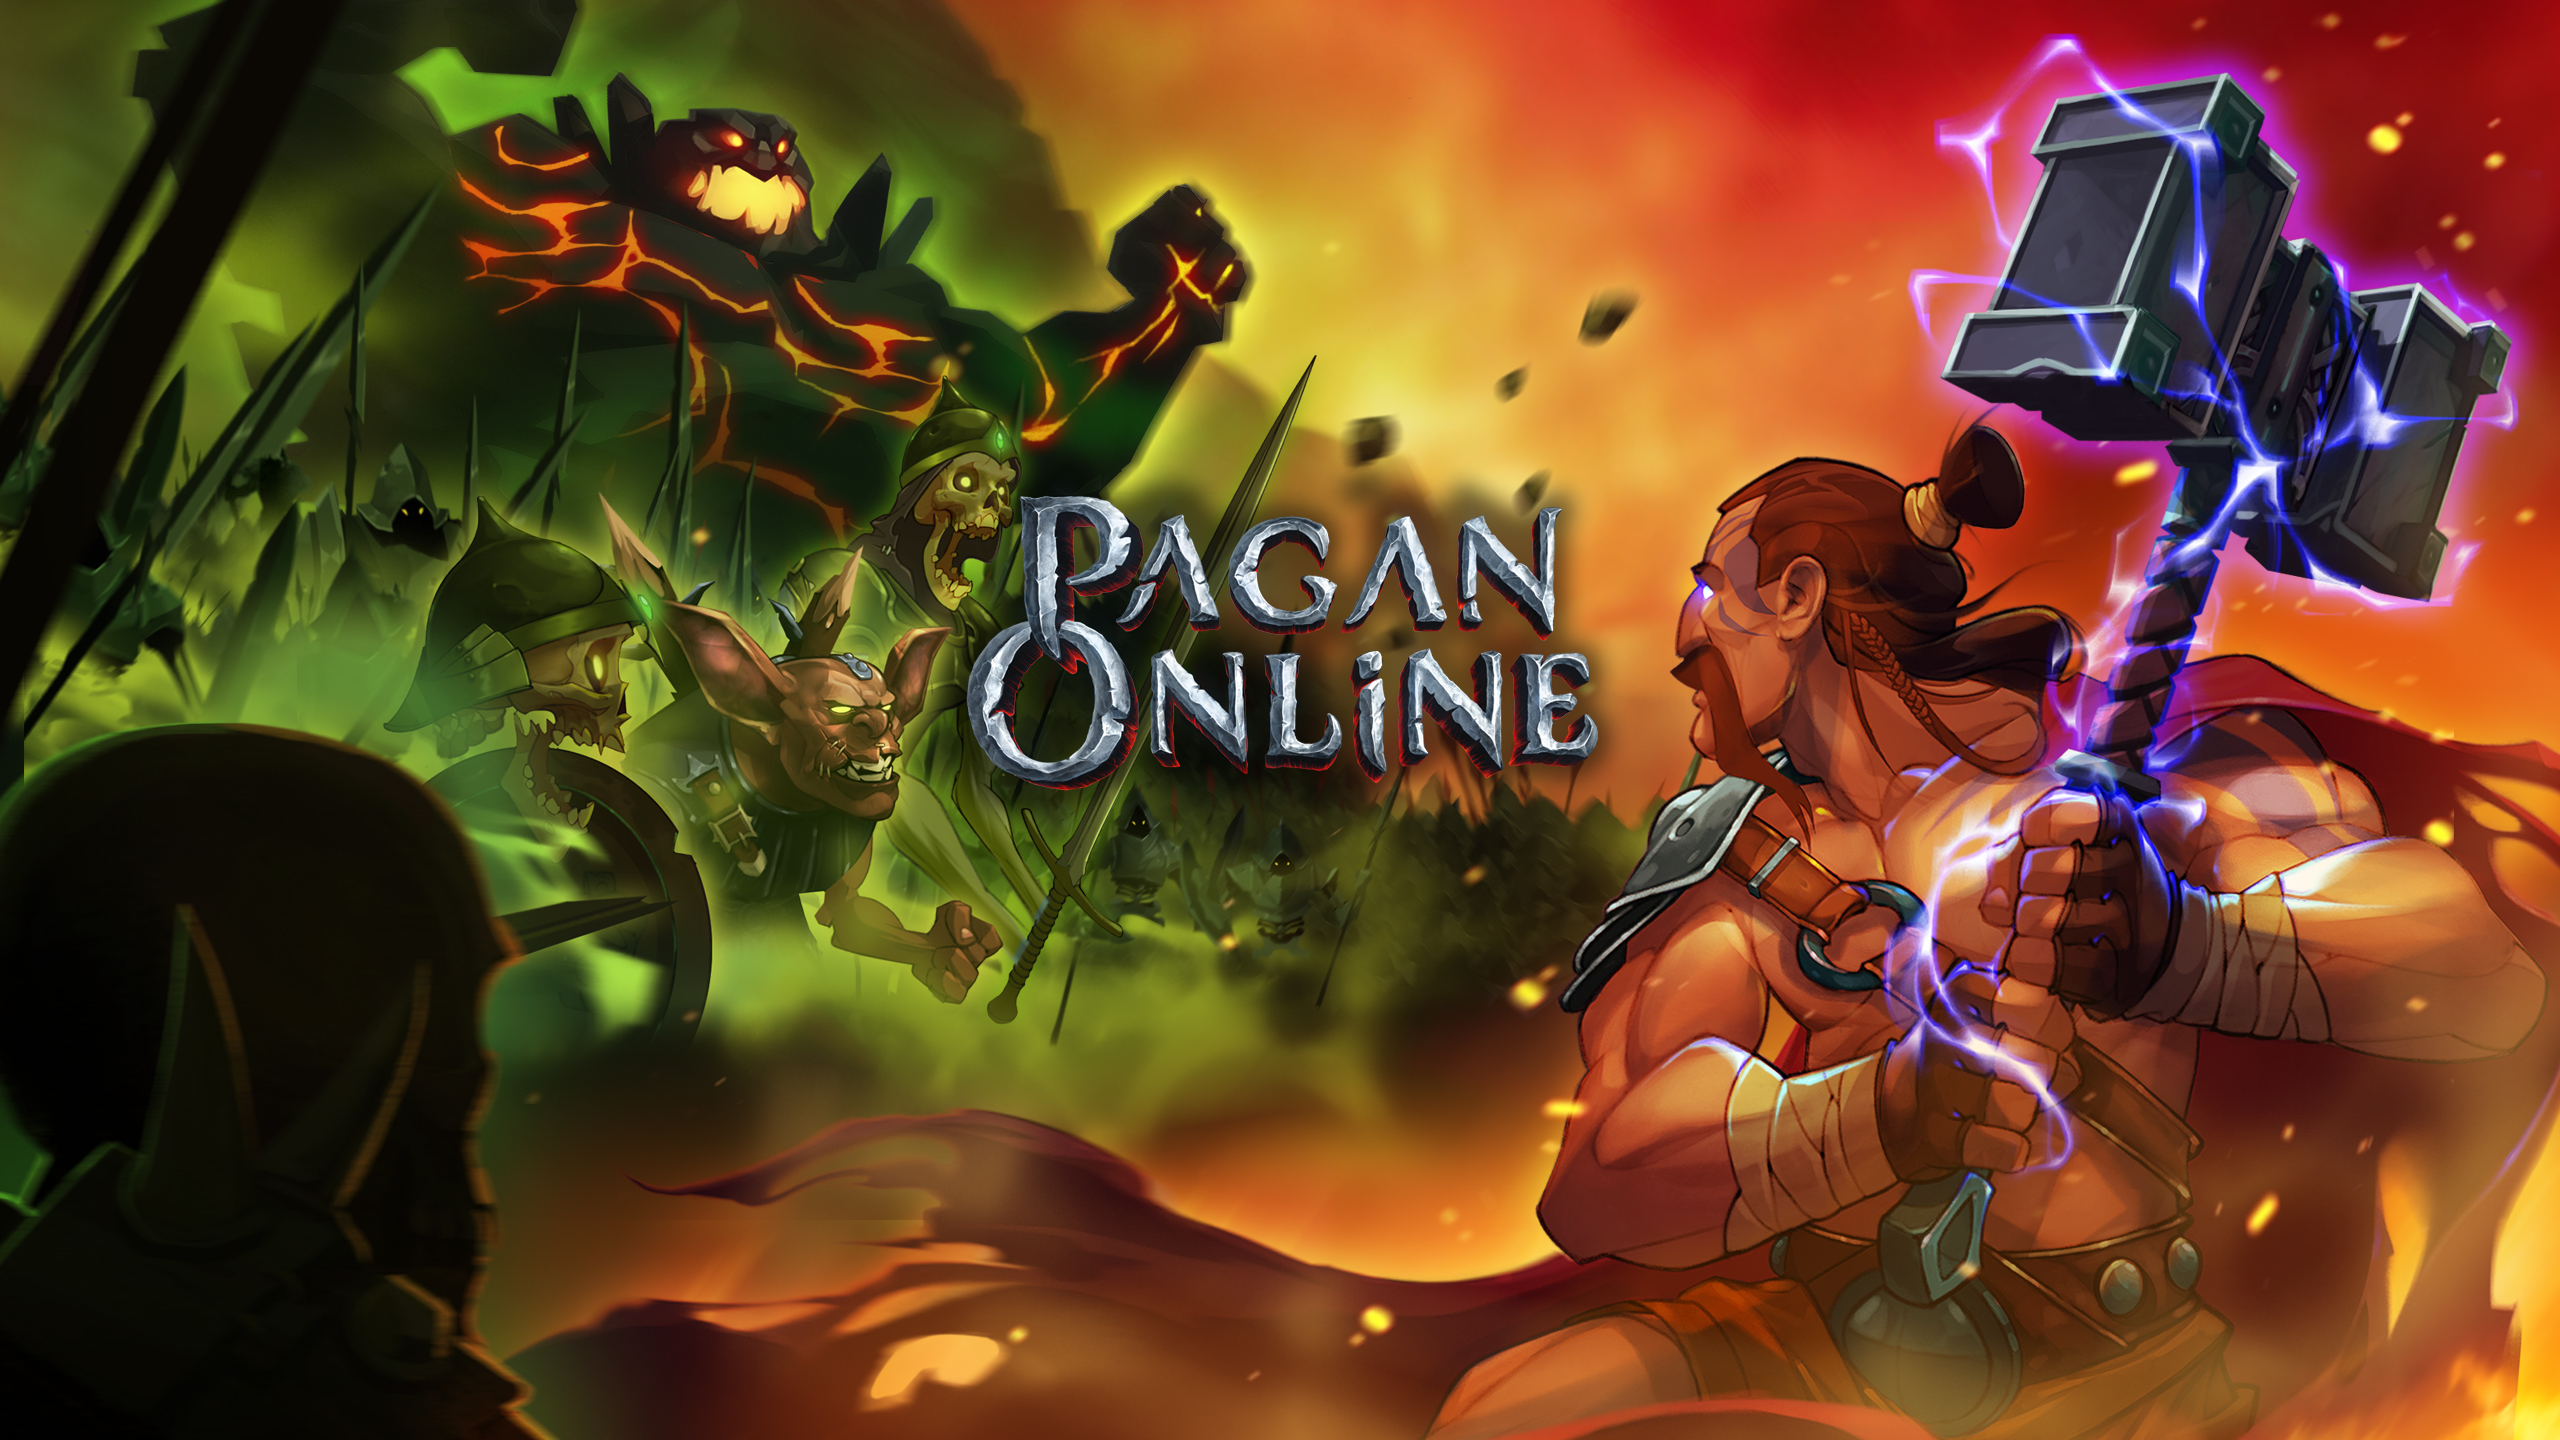 Pagan Online Announcement Trailer, Release Date, Beta Test